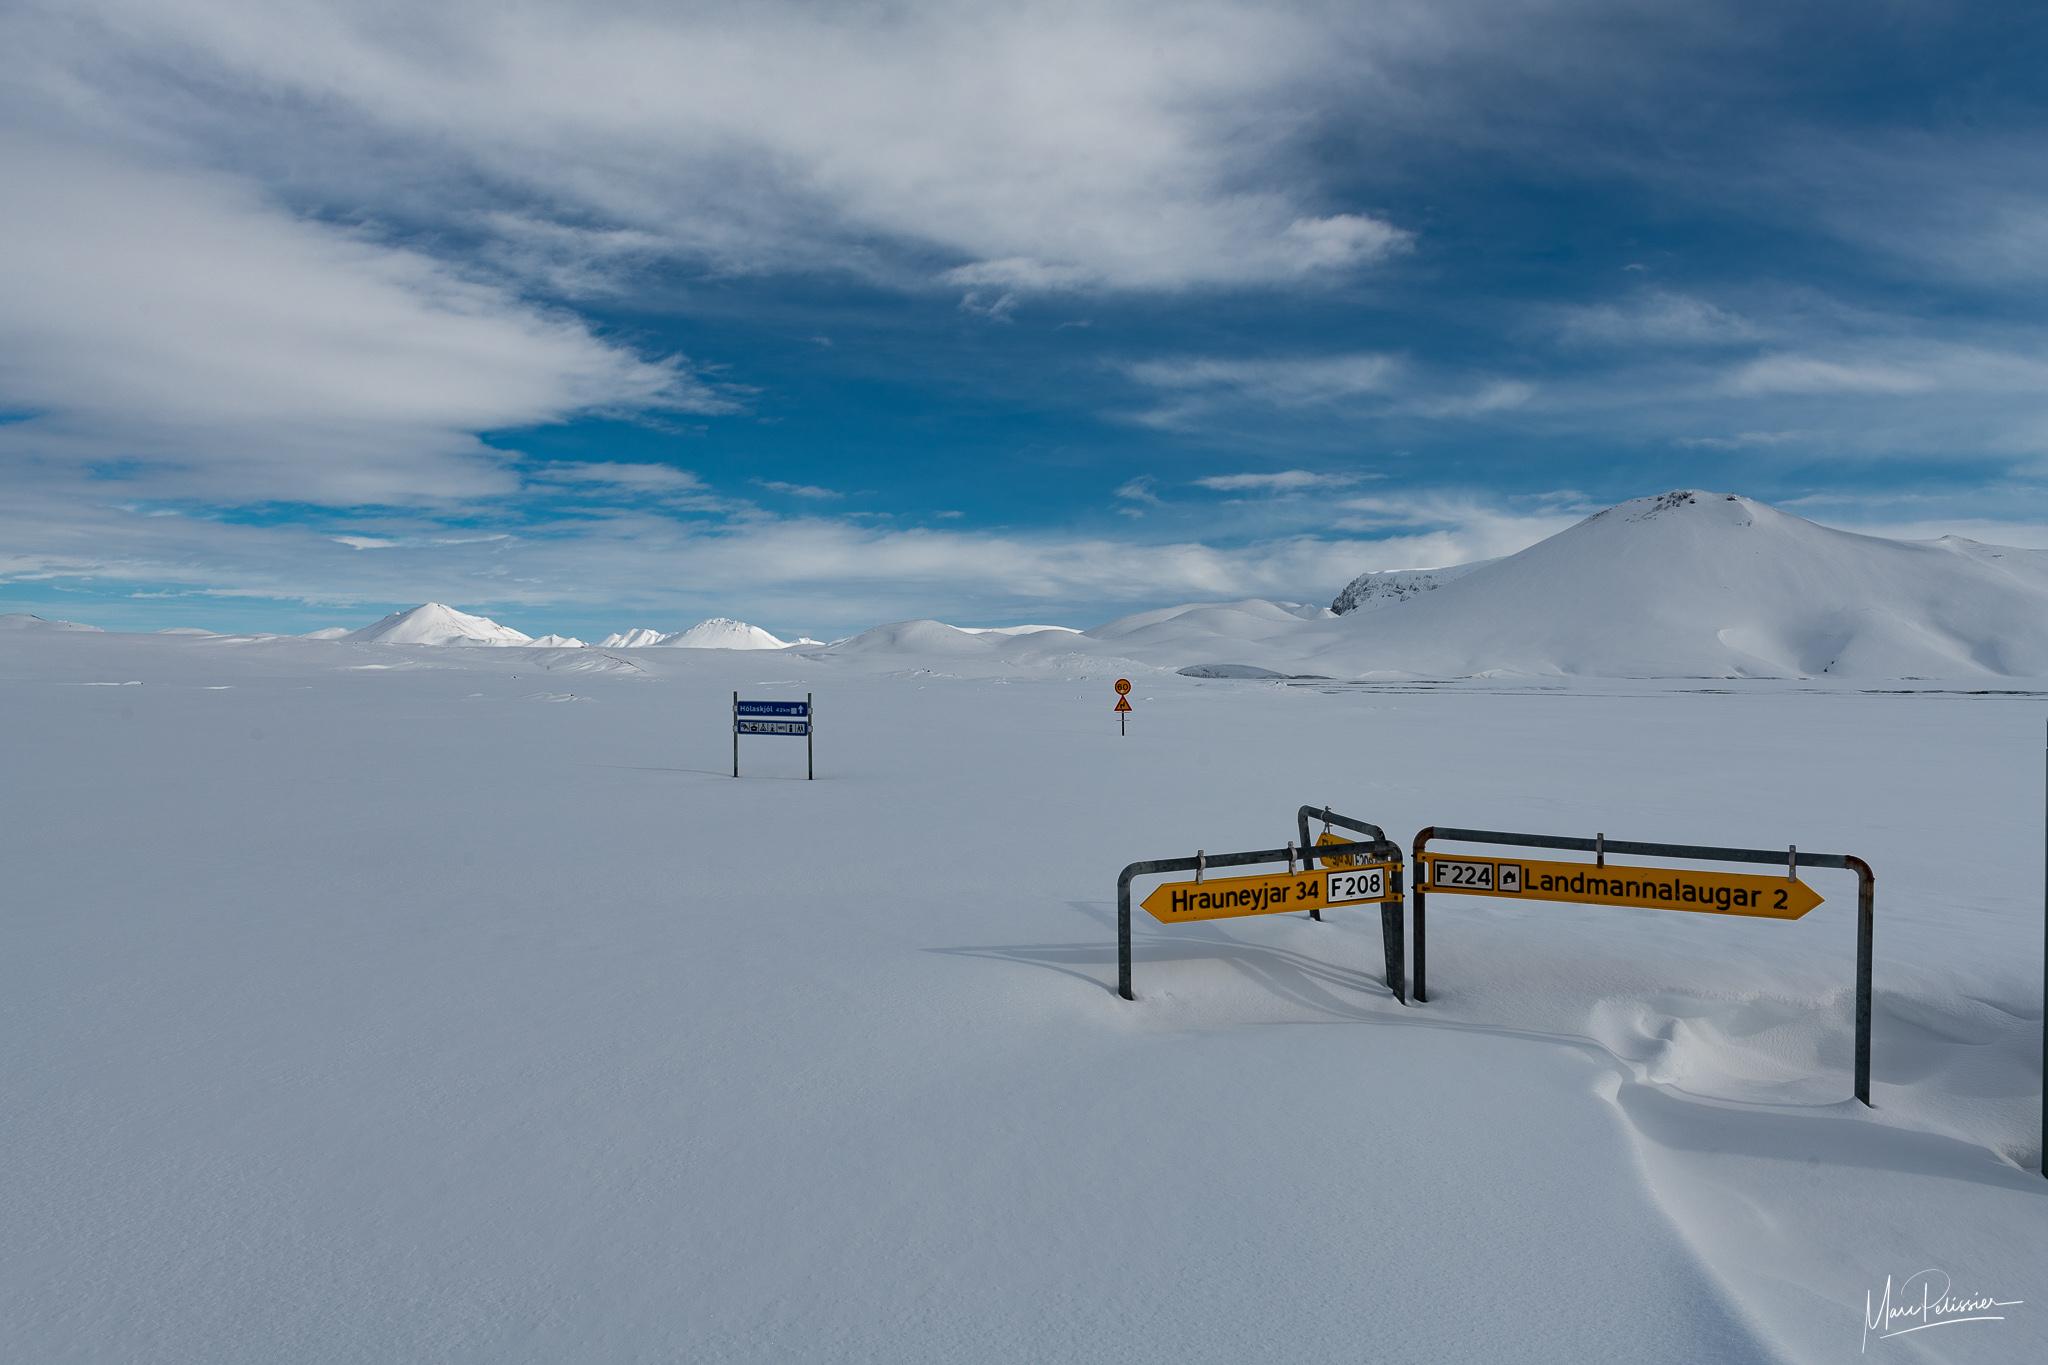 Landmannalaugar crossroad in snow, Iceland